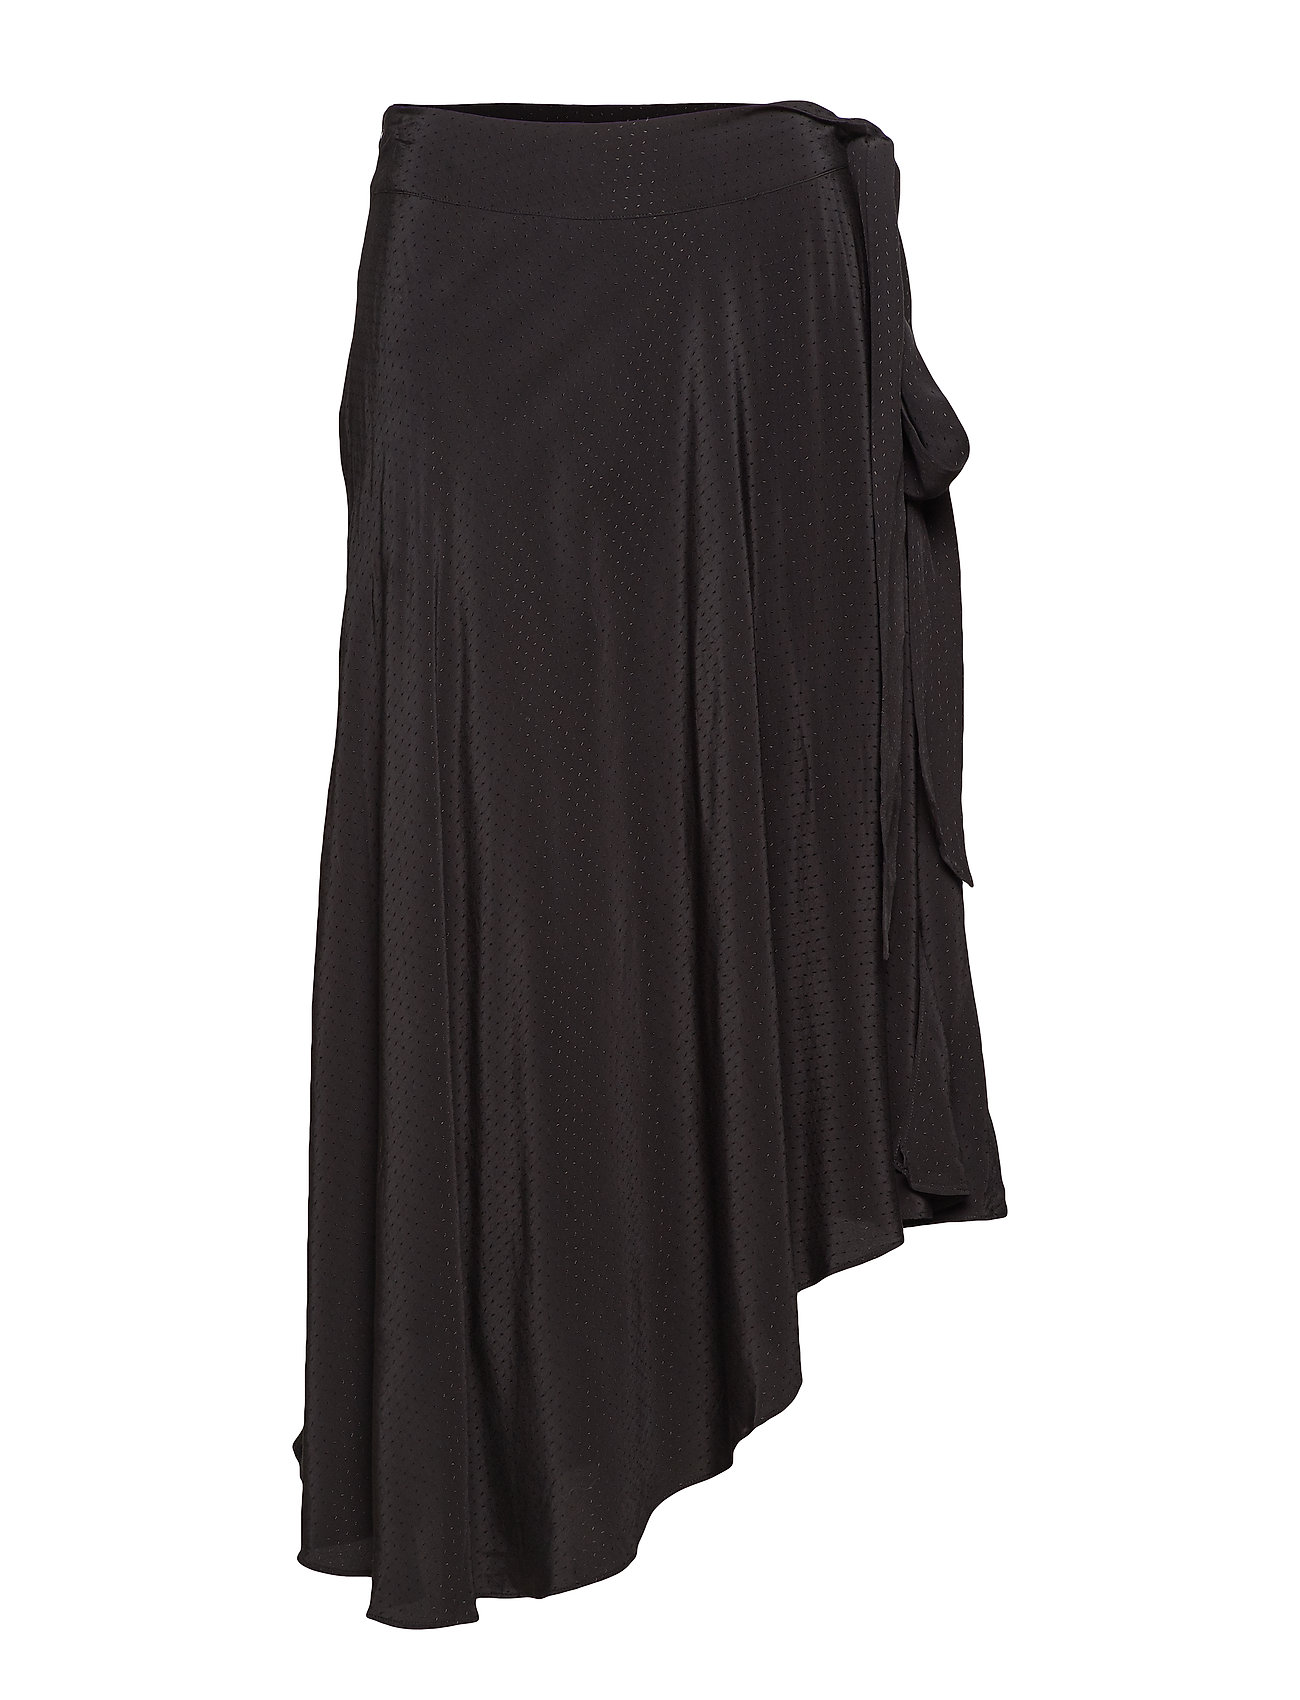 L Chila Skirt L Skirt 10458blackSamsøeamp; Chila PnN0XZ8wOk